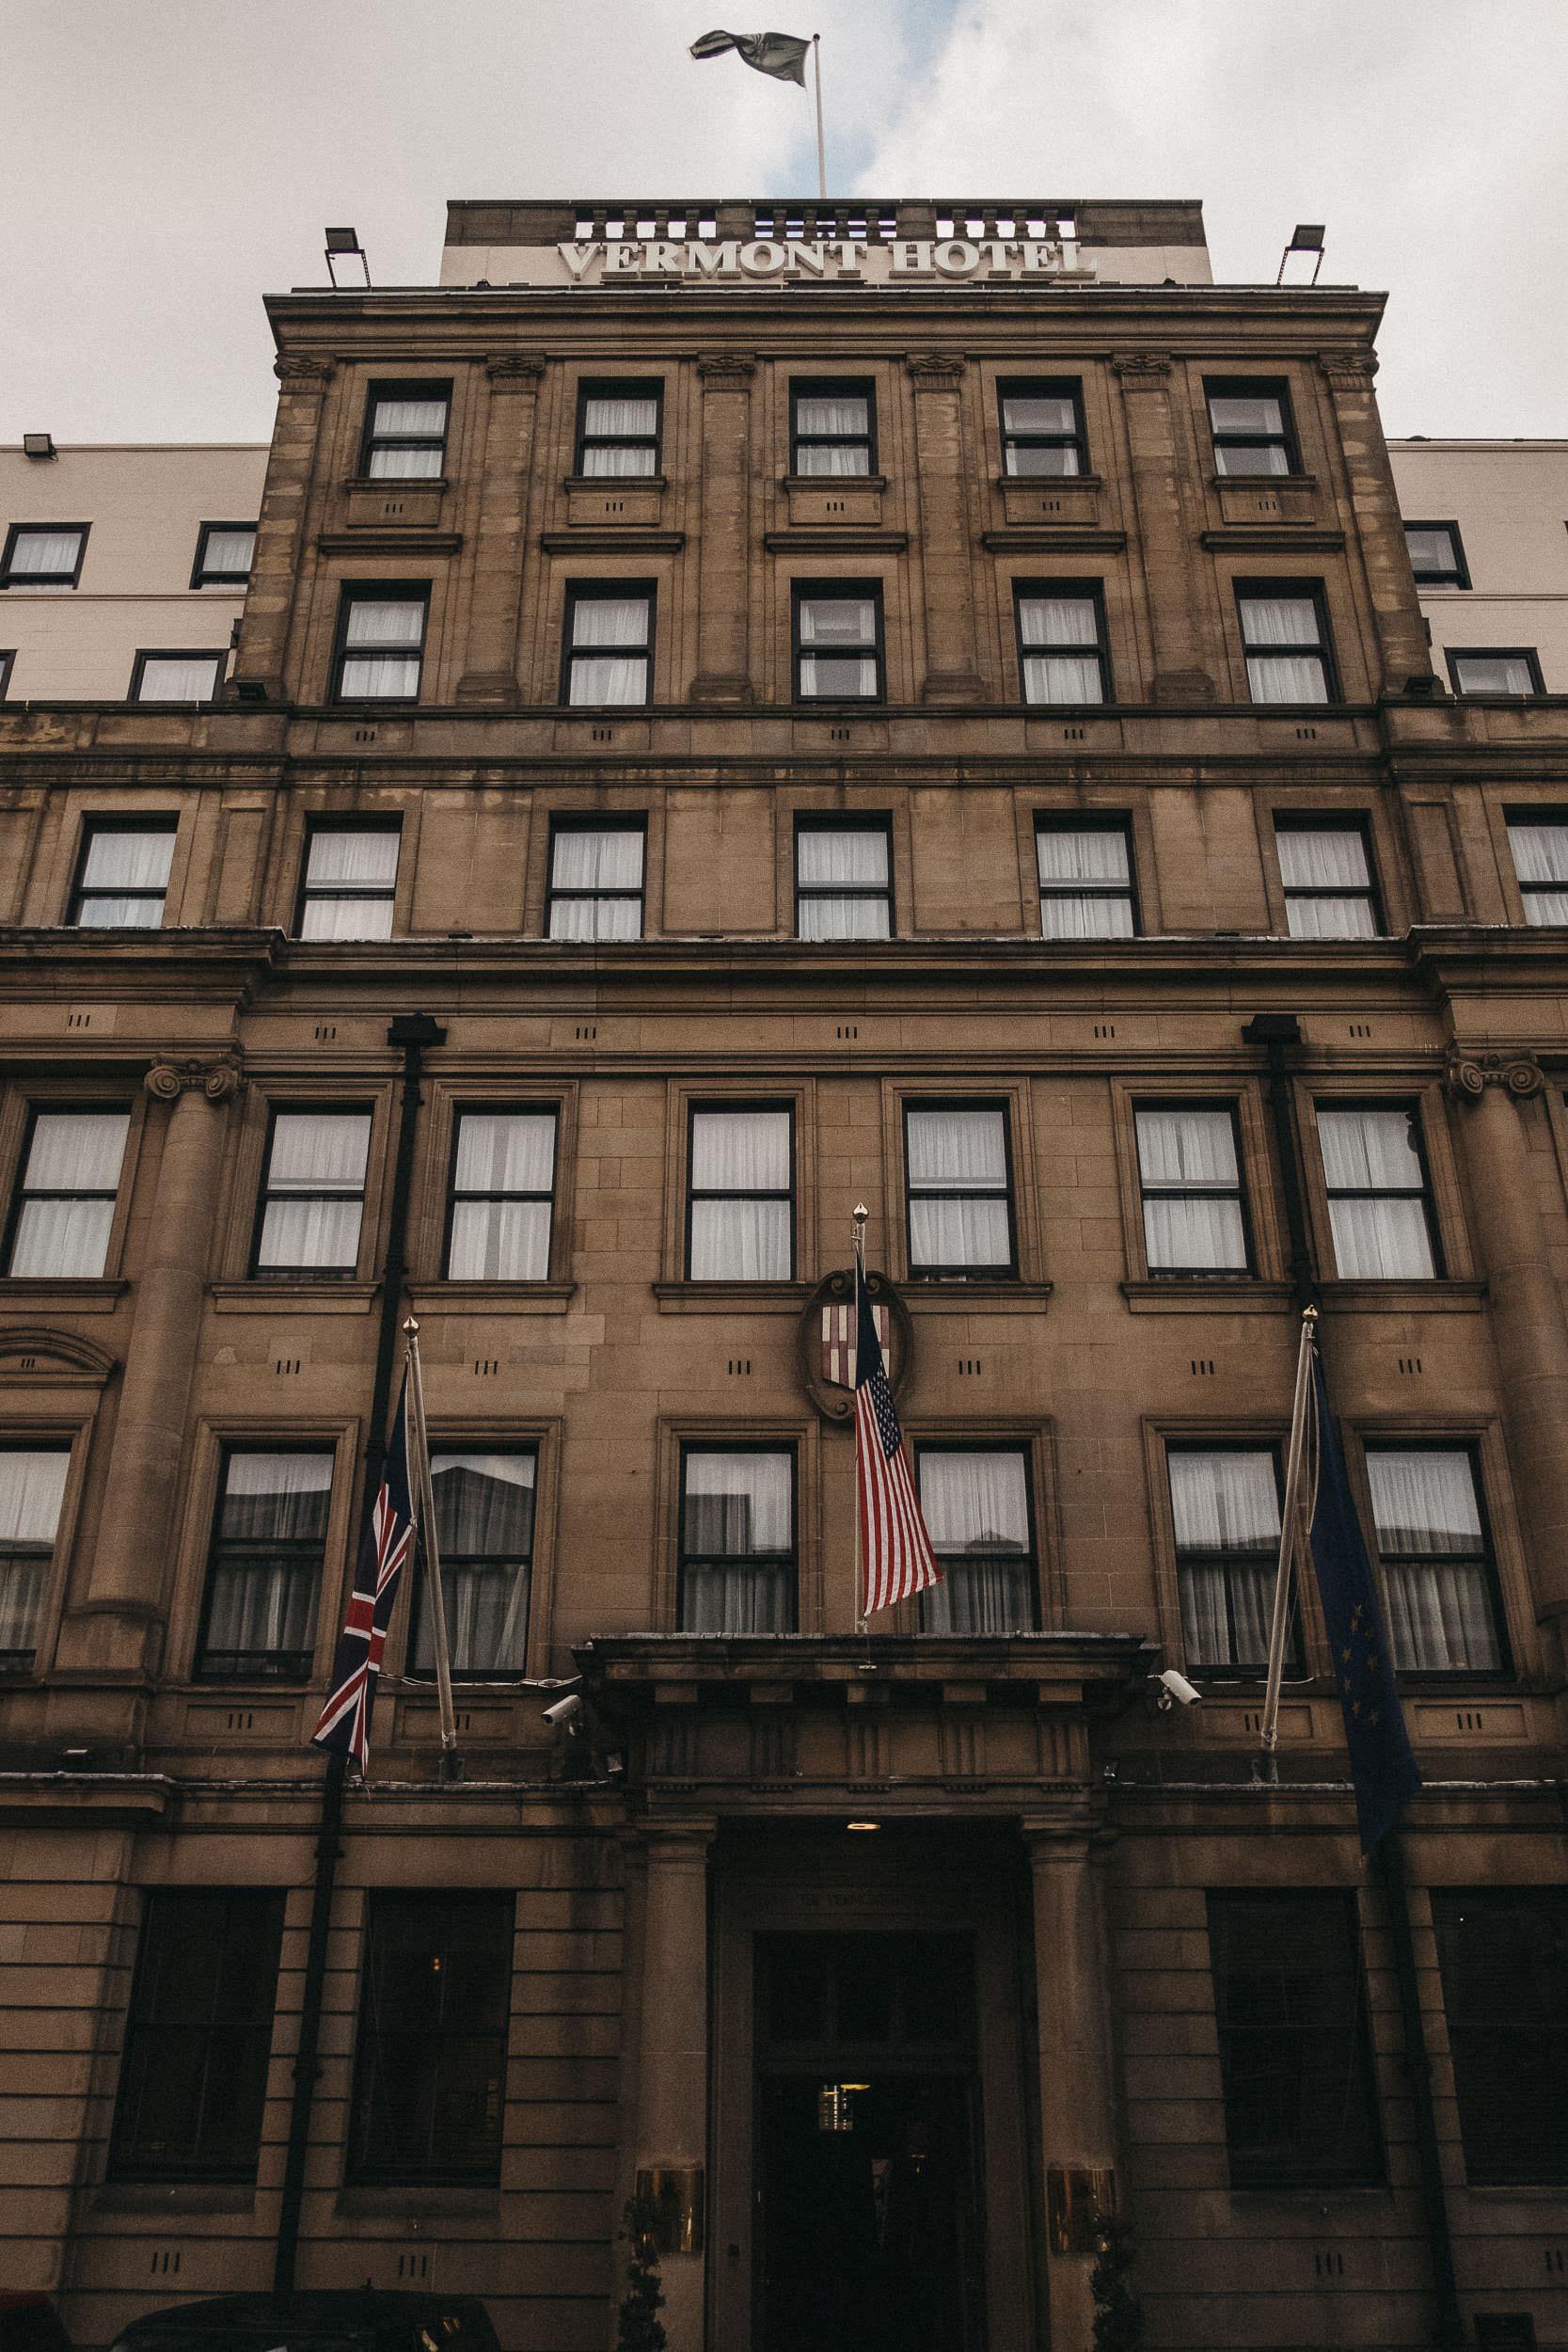 Exterior of Vermont Hotel Newcastle upon Tyne